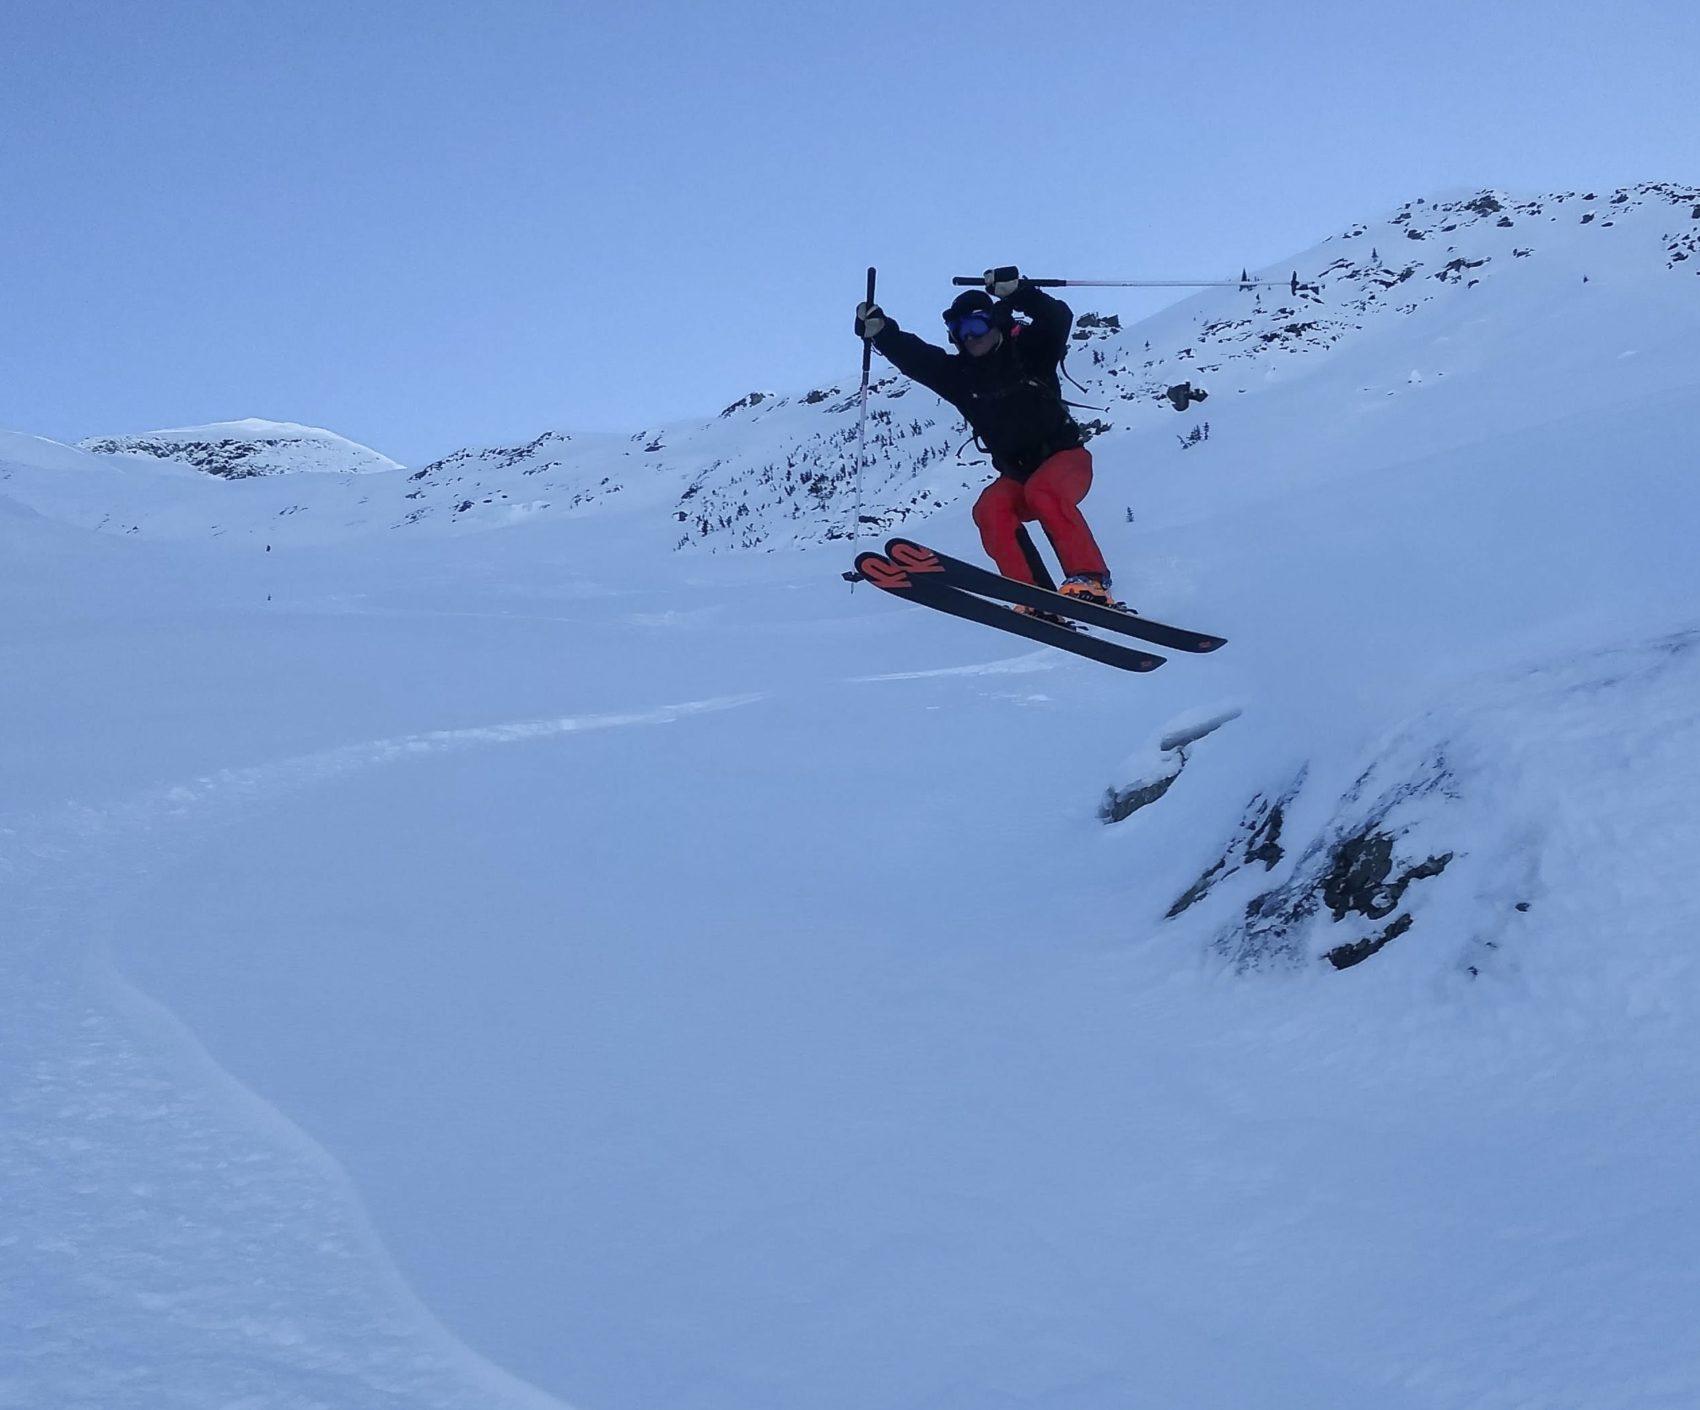 skier leaping off boulder